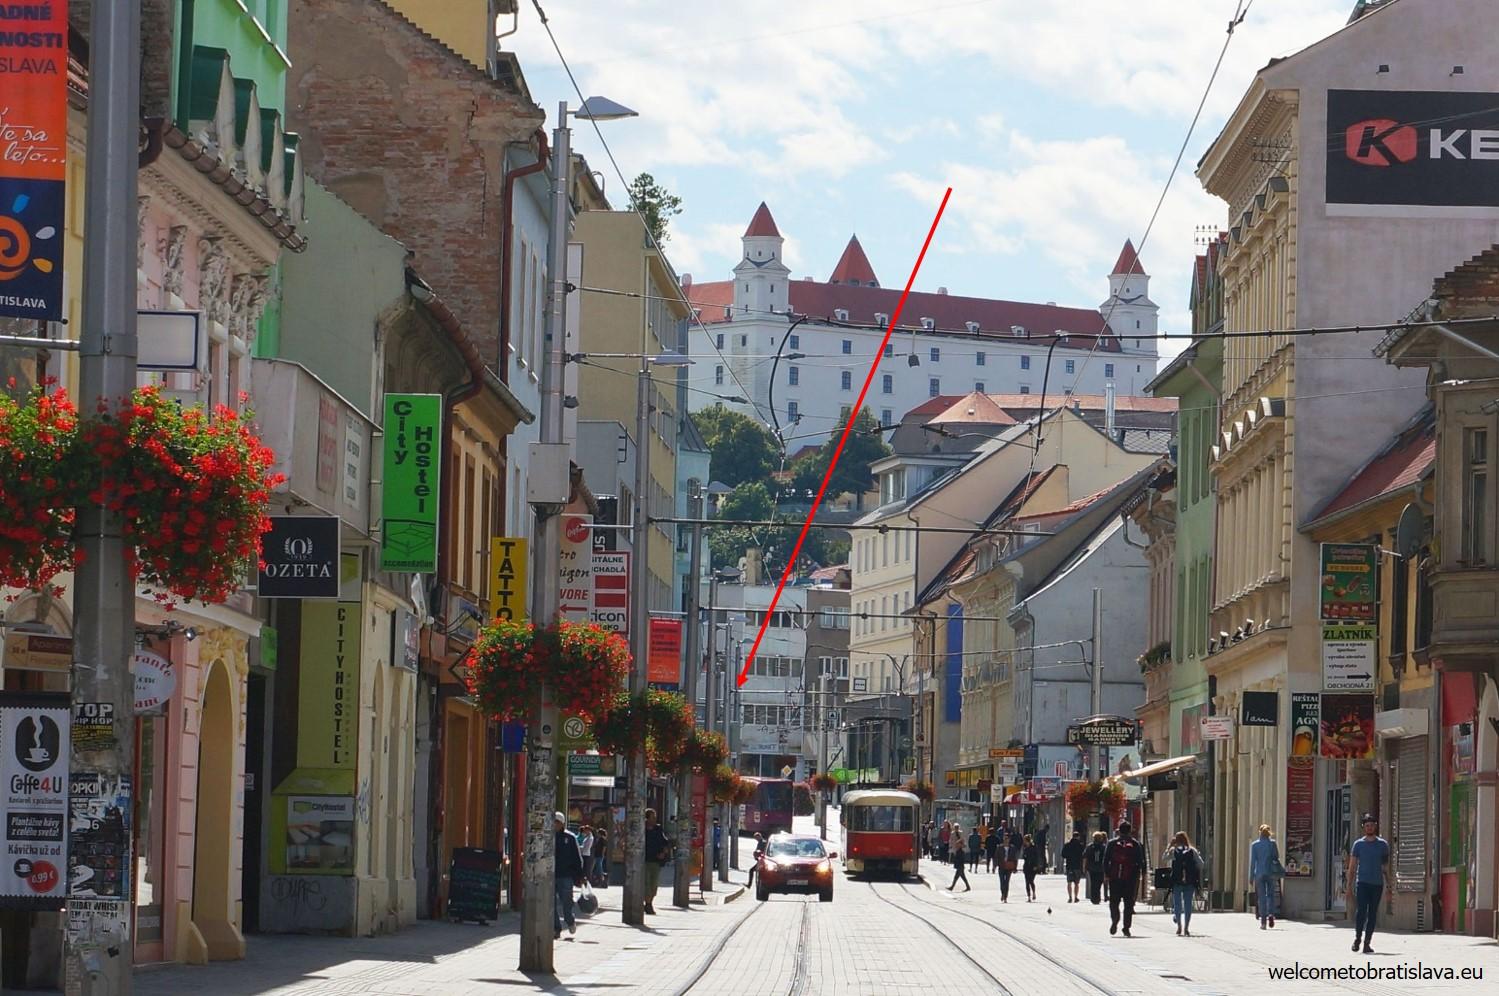 Obchodna street